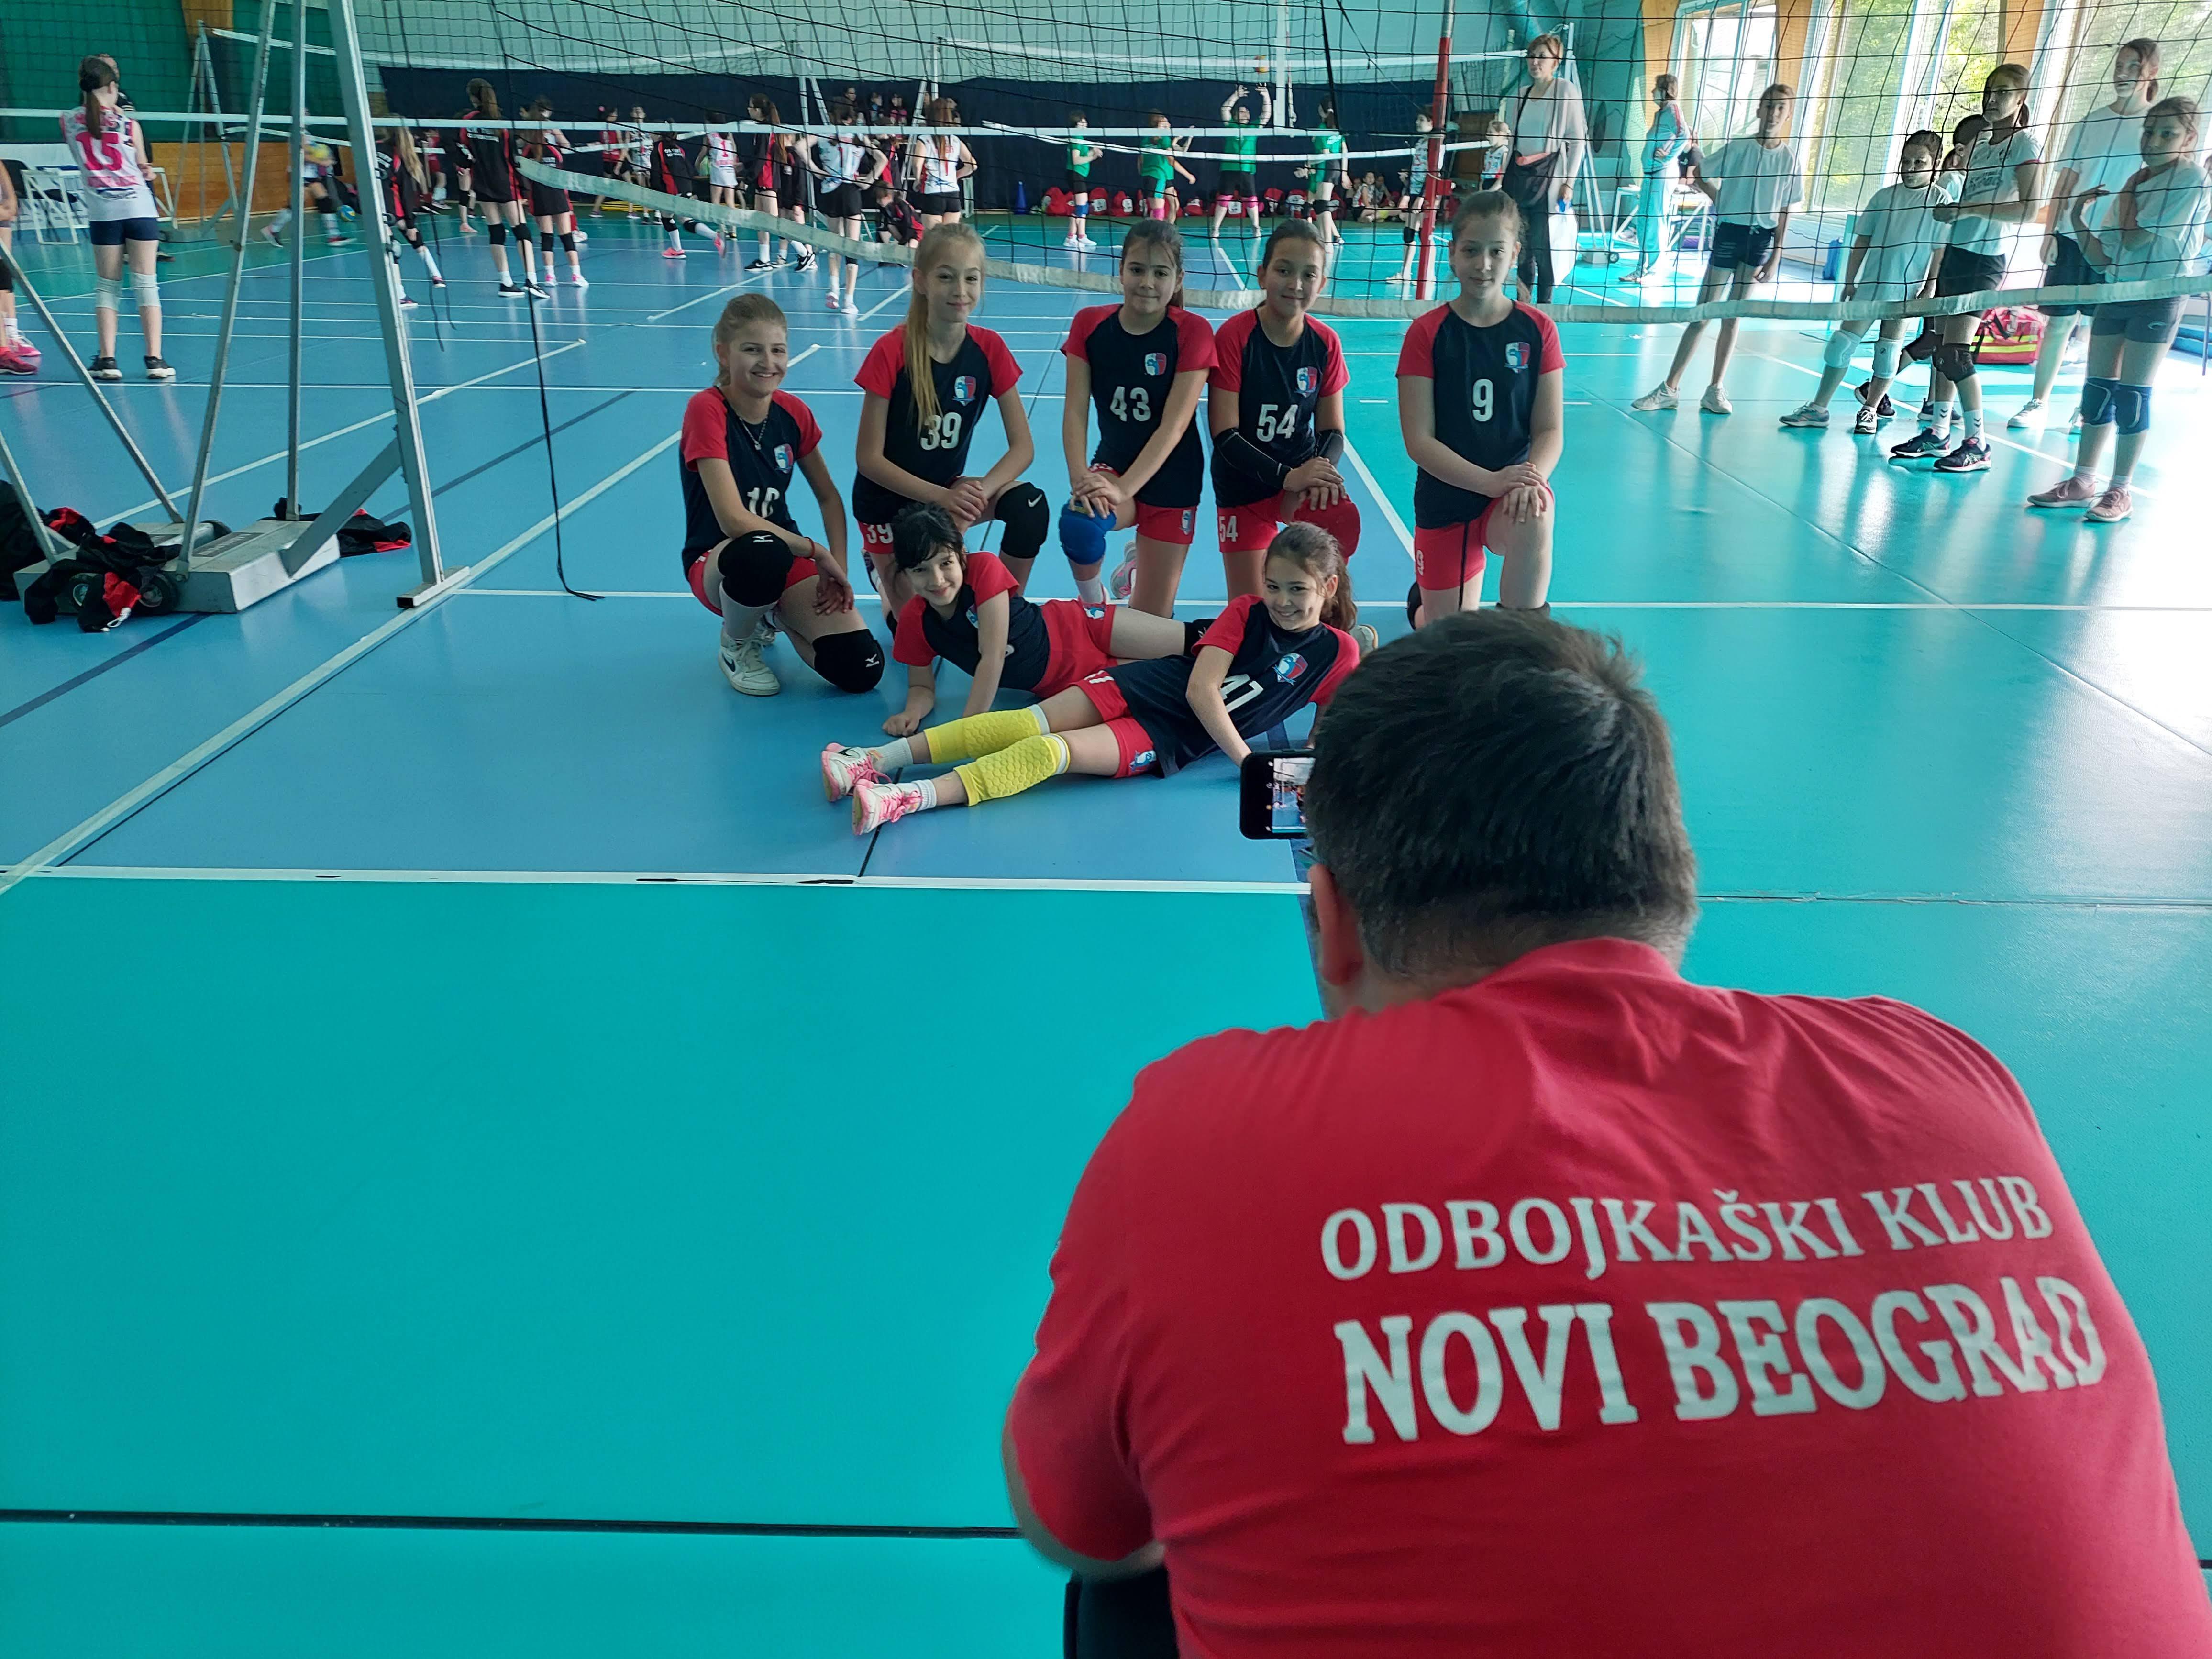 Kapiteni i ekipe | Mini Volley liga | III - IV kolo | sezona | 2020/2021 - 1